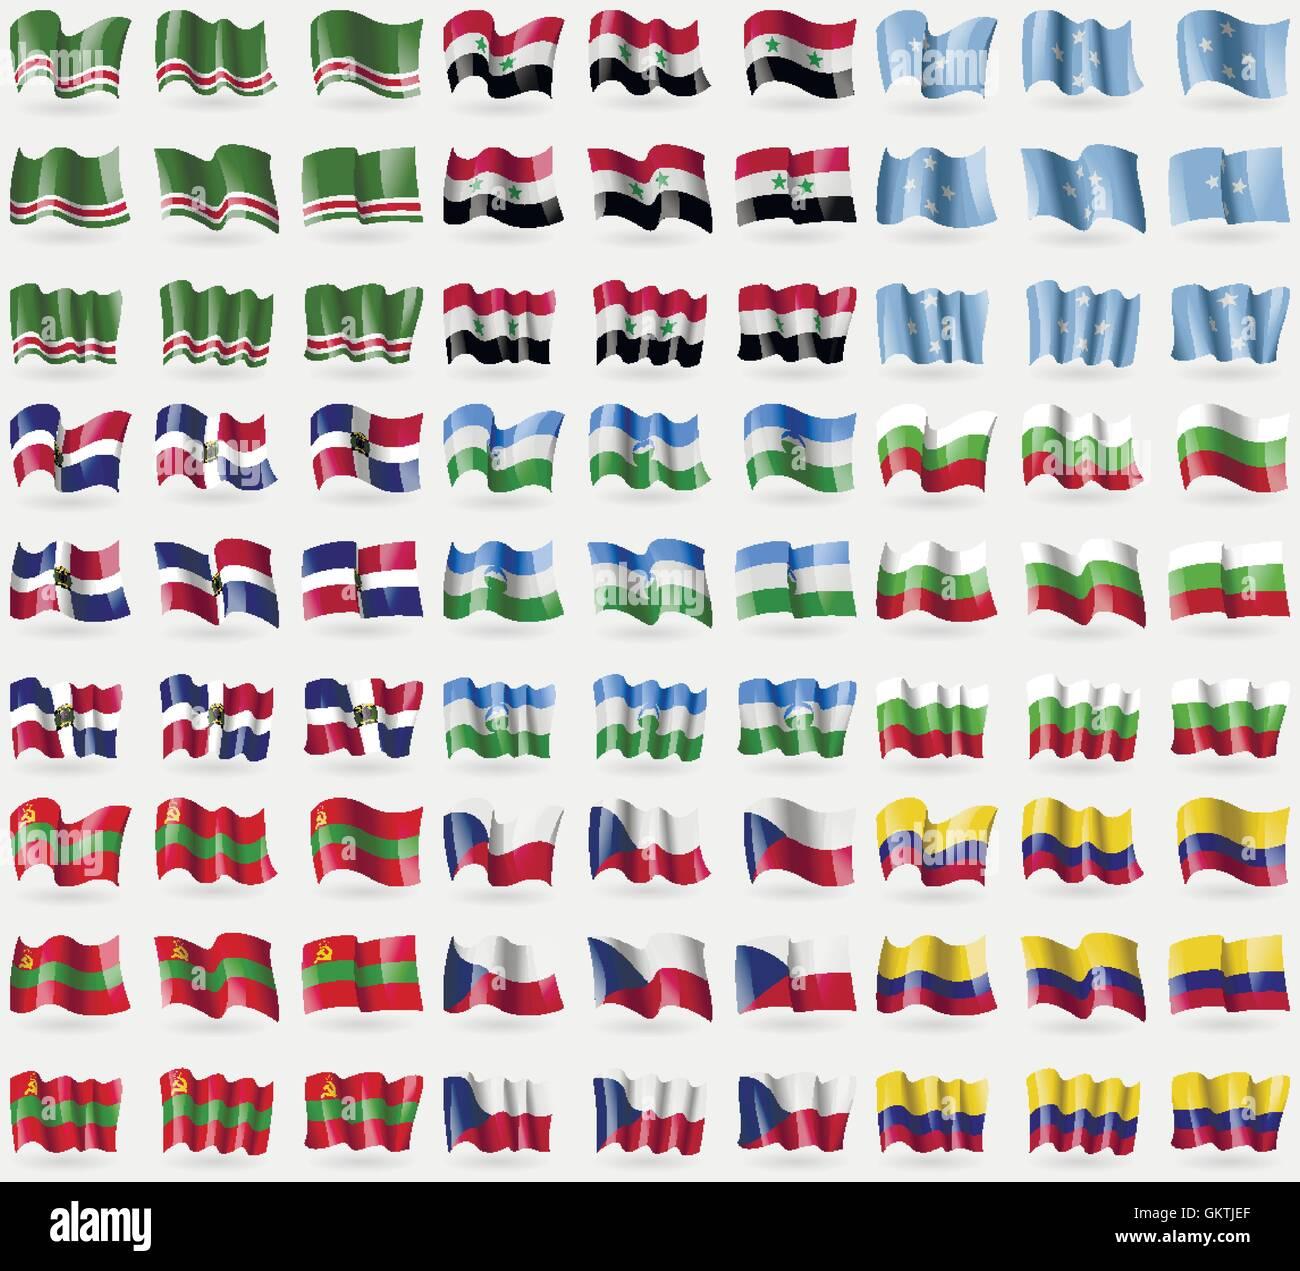 Chechen Republic of Ichkeria, Syria, Micronesia, Dominican Republic, KabardinoBalkaria, Bulgaria, Transnistria, - Stock Image